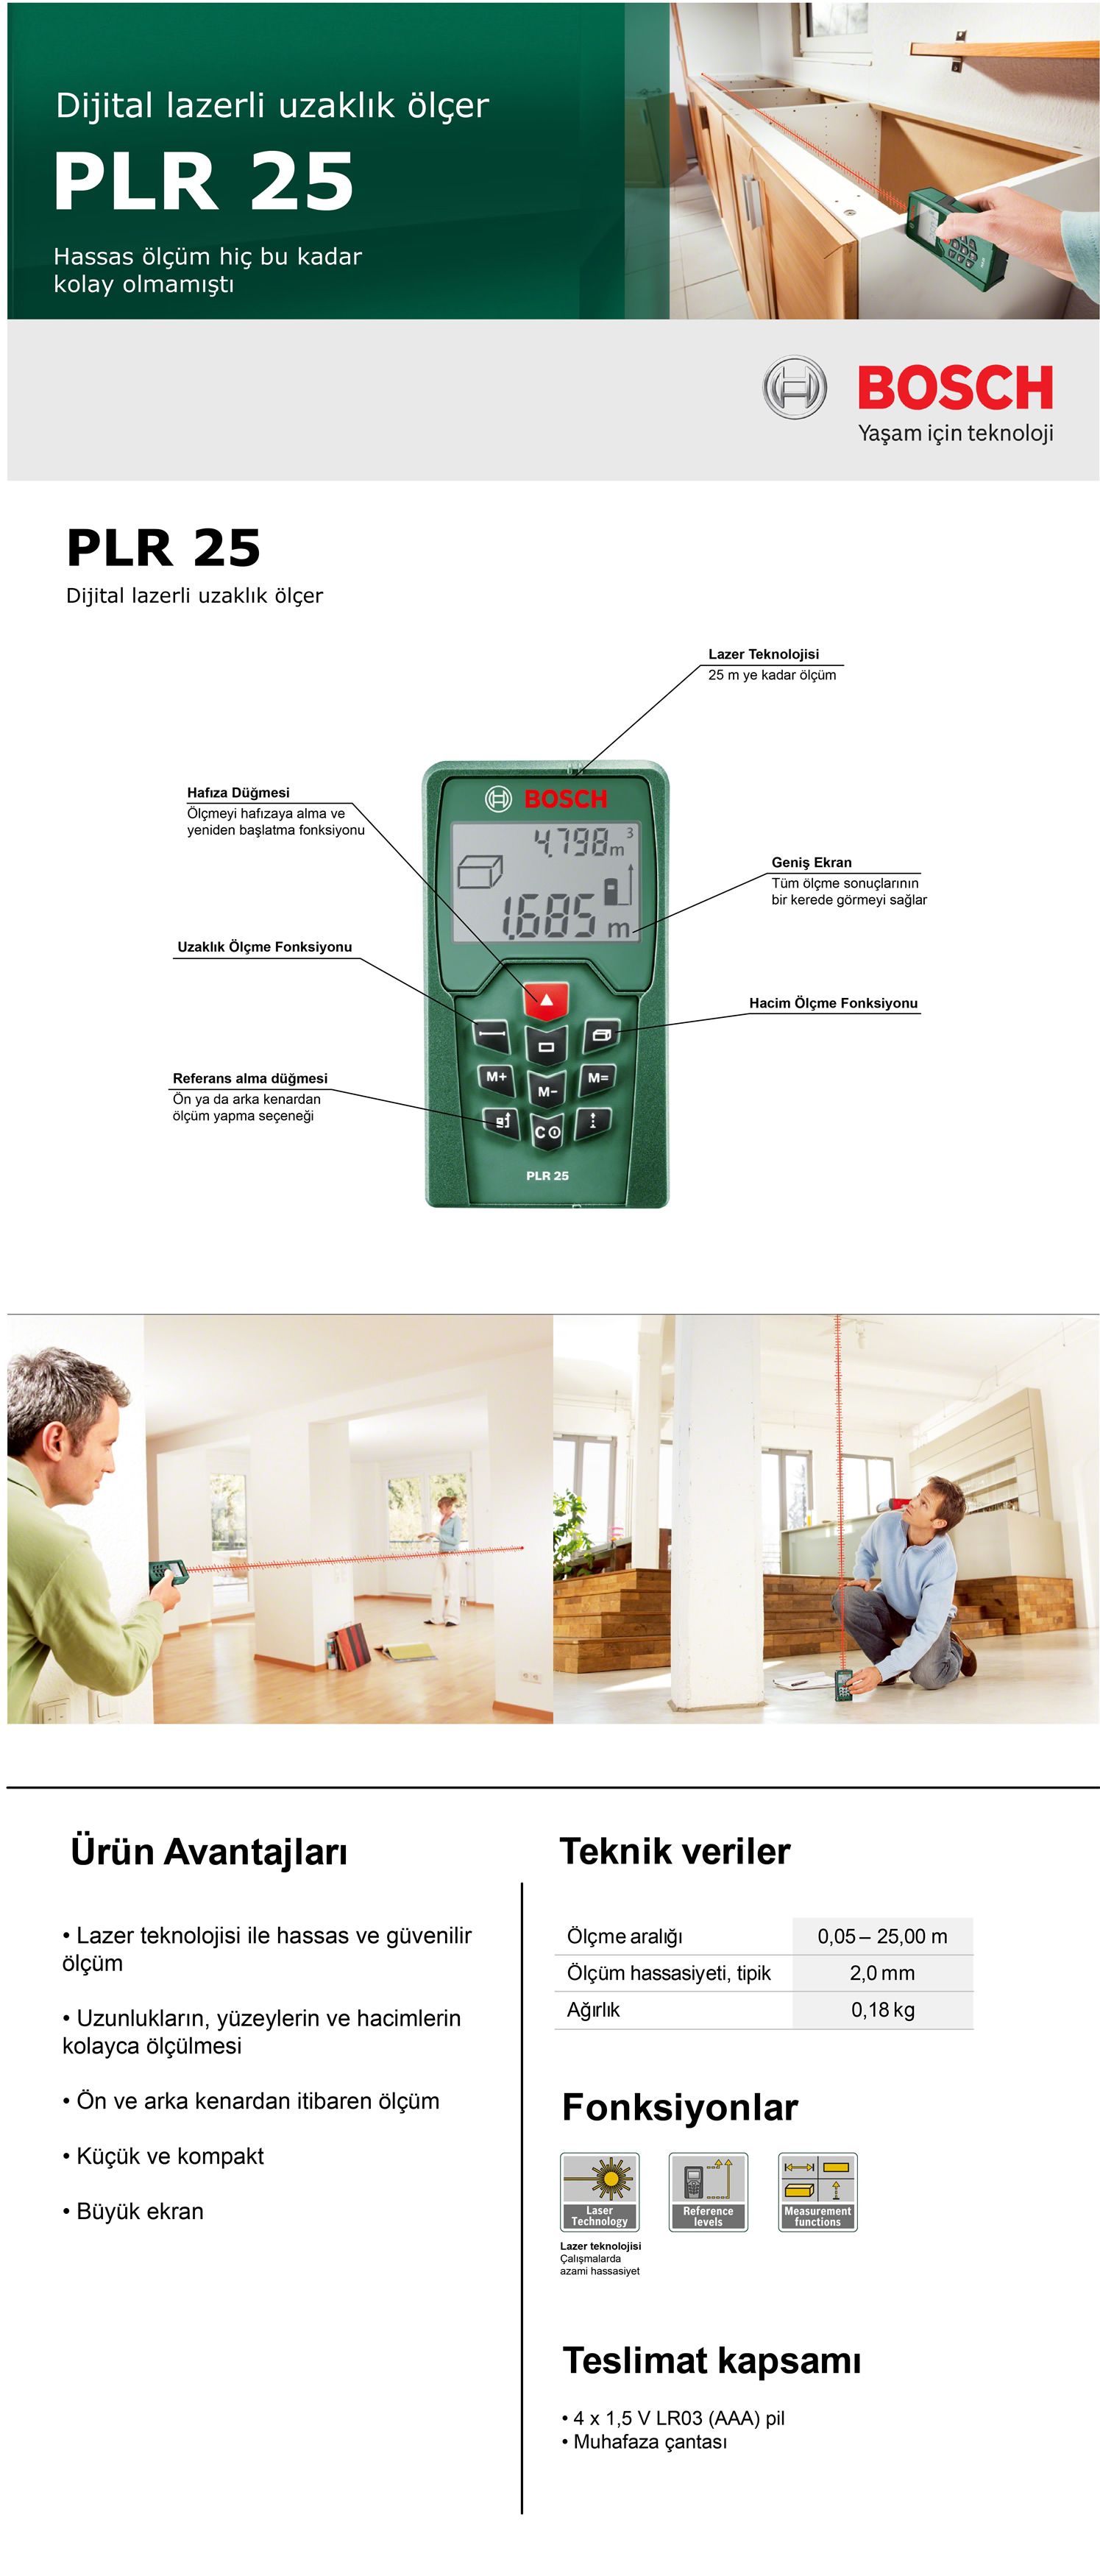 bosch plr 25 lazermetre modelleri ve fiyatlar tekzen. Black Bedroom Furniture Sets. Home Design Ideas